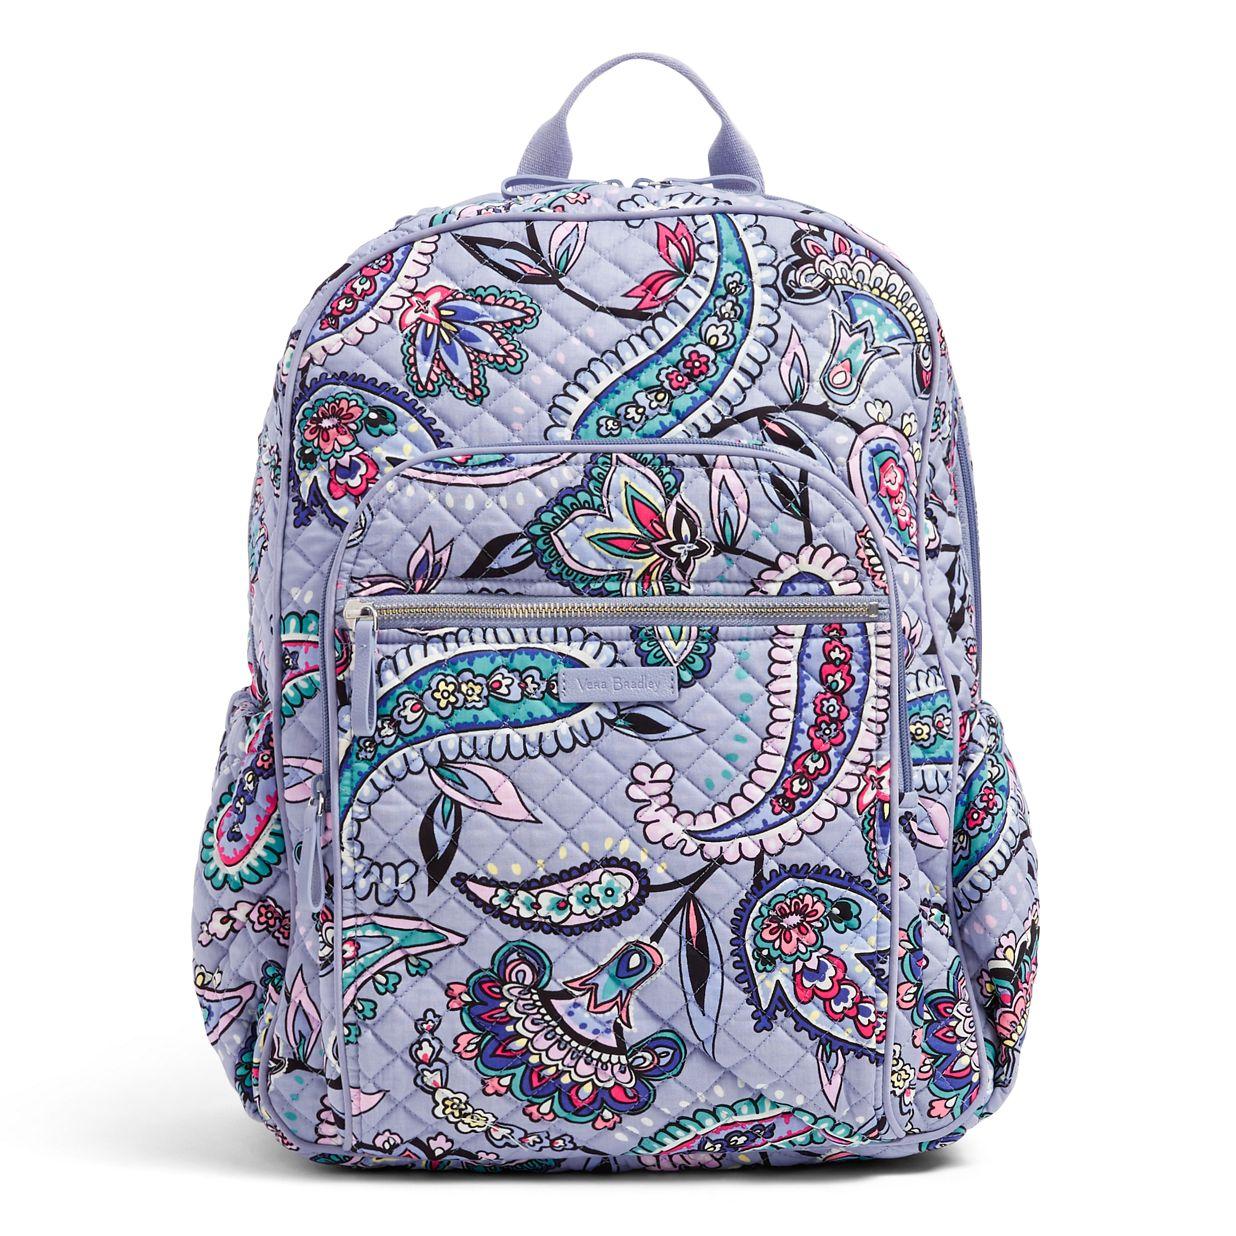 Iconic Campus Backpack Vera Bradley